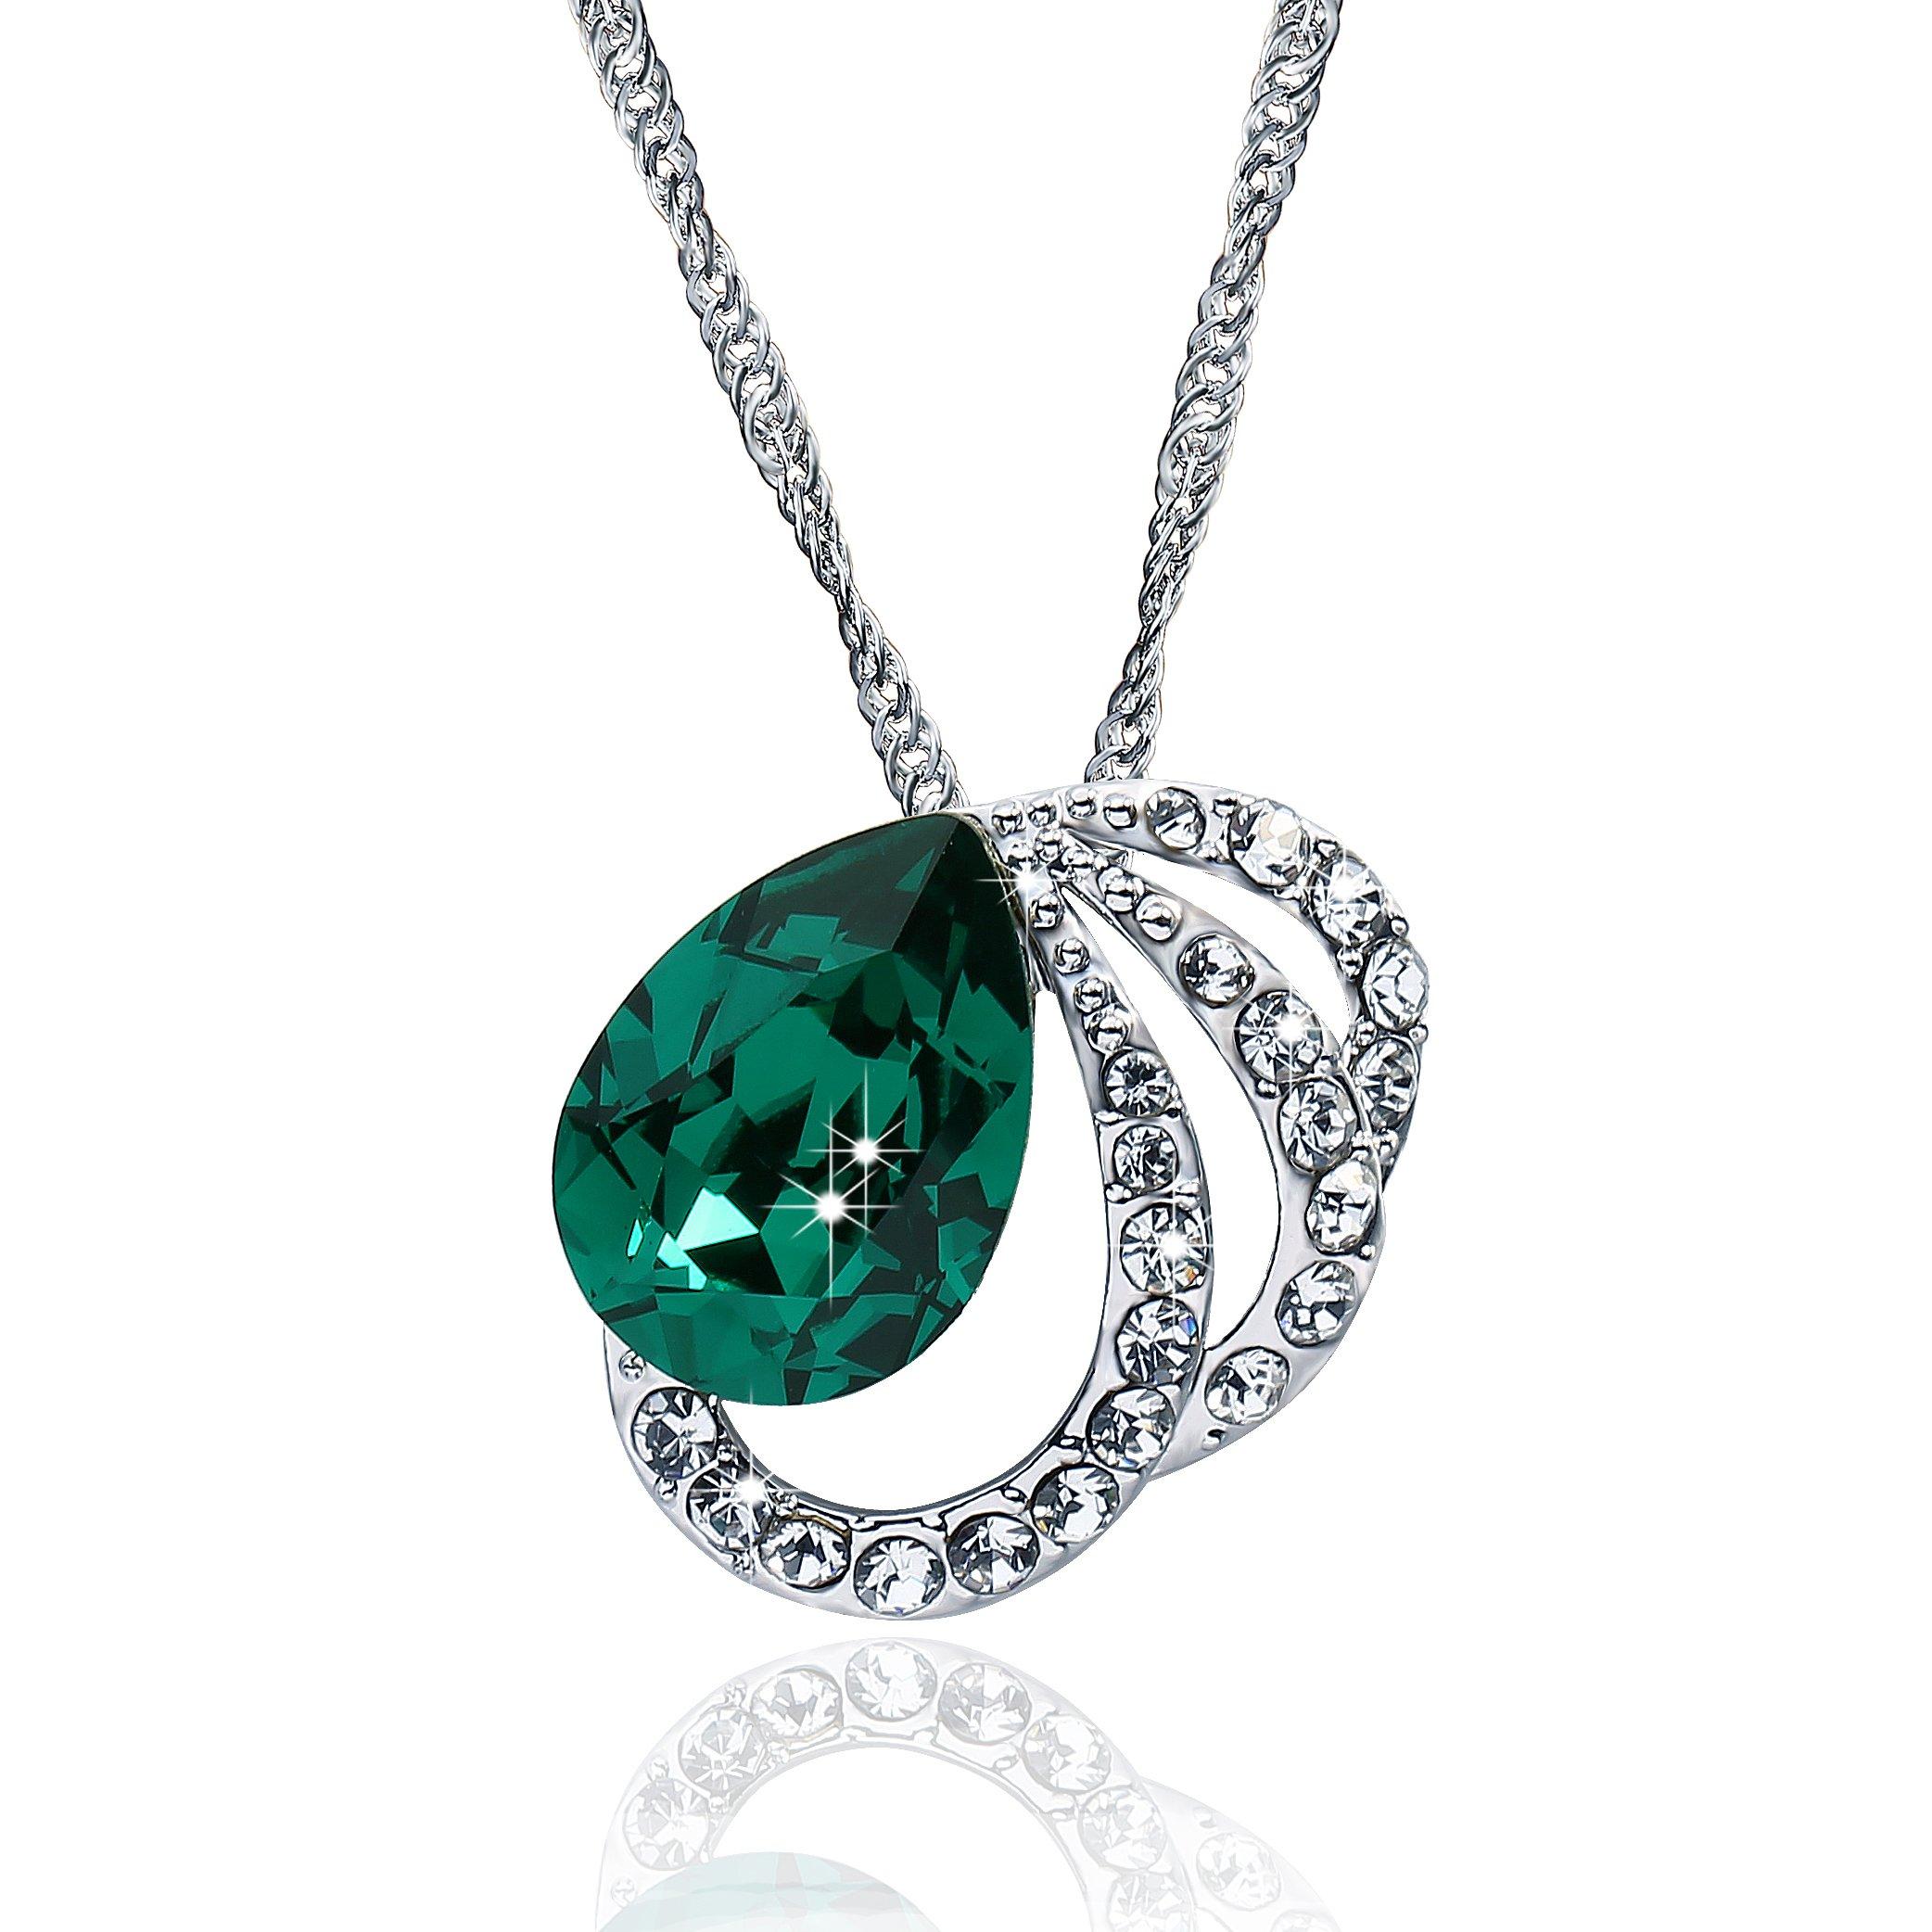 Vancona 1920 Style Wedding Jewelry Green Stone Pendant Necklace with Swarovski Elements